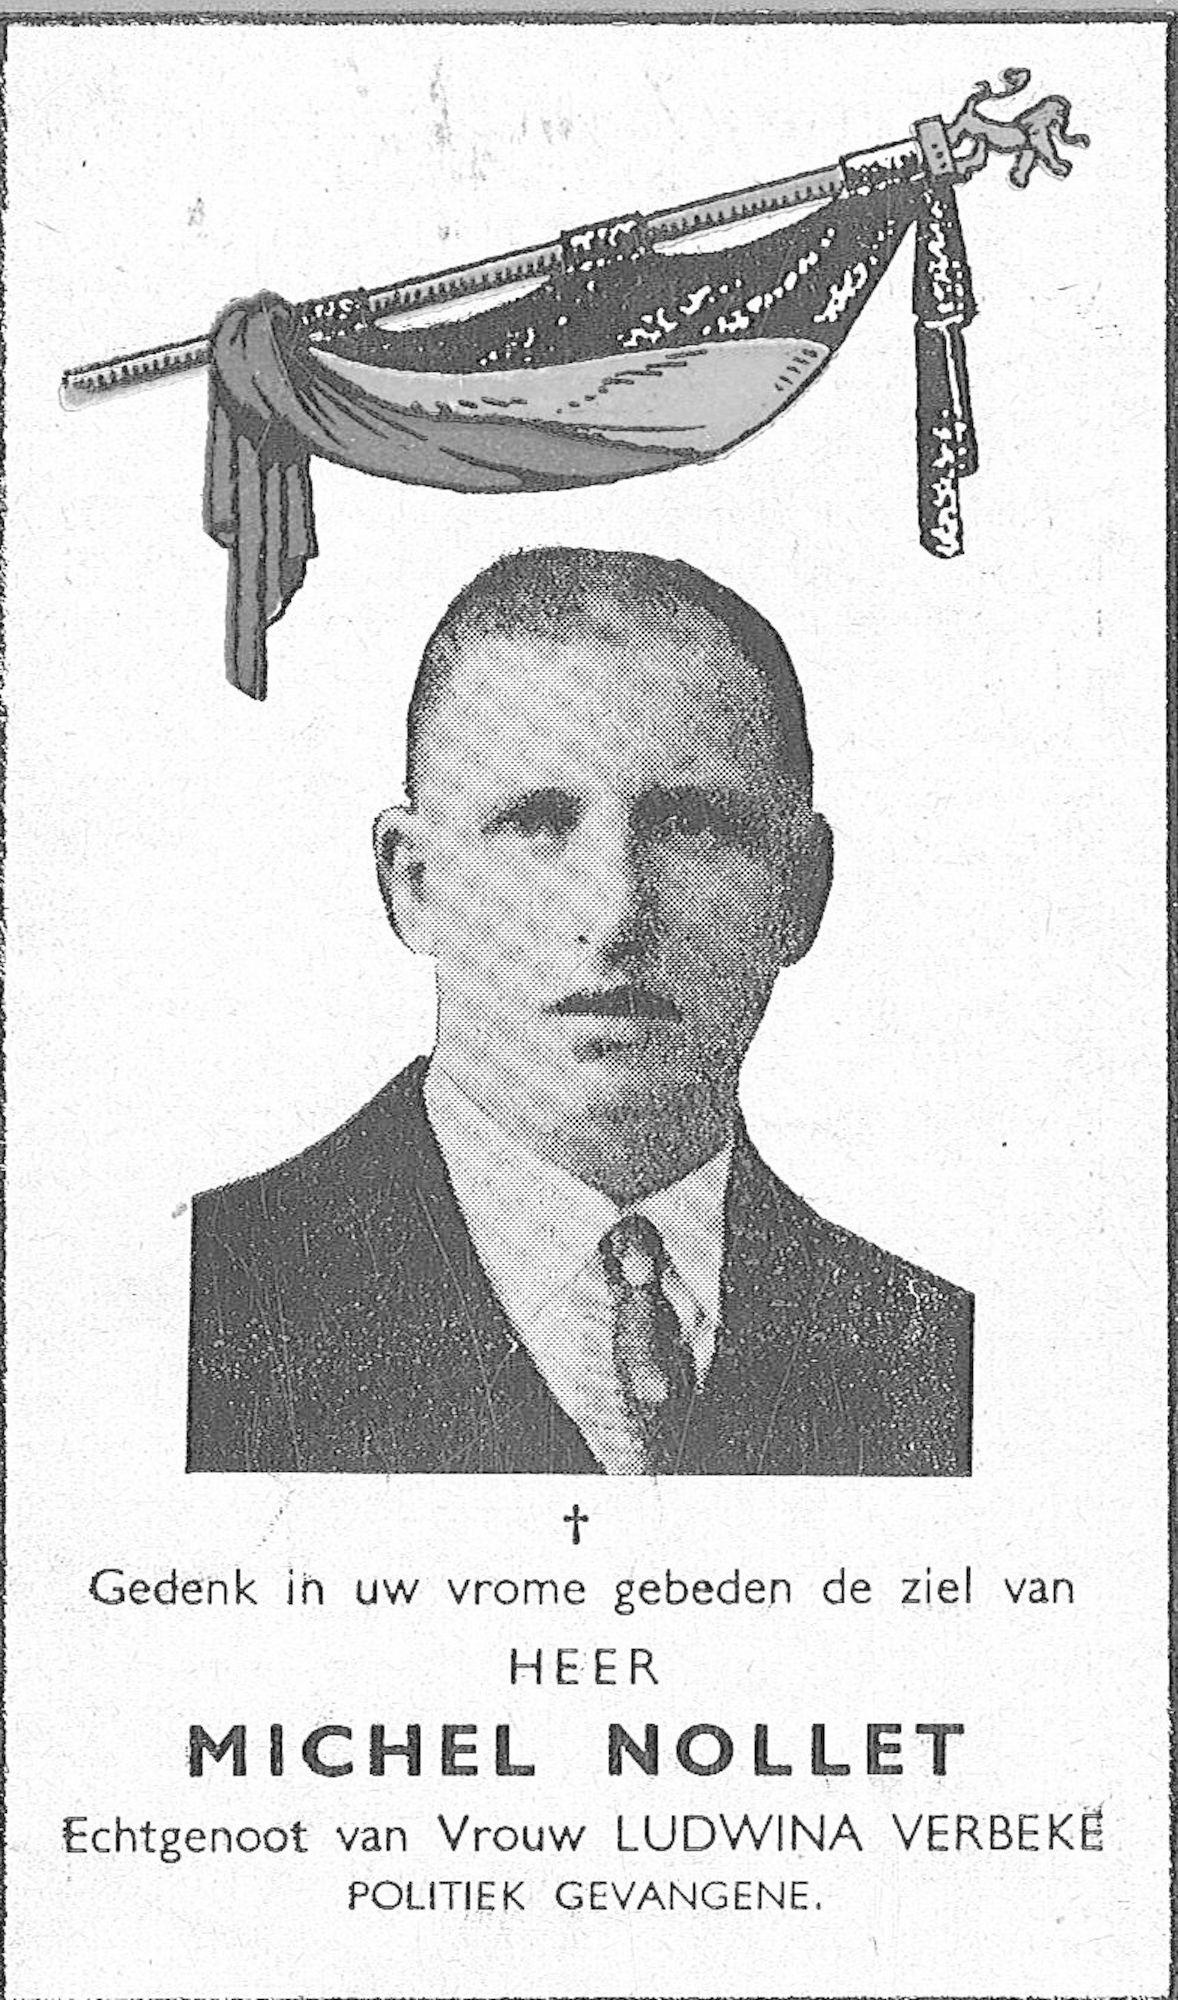 Michel Nollet